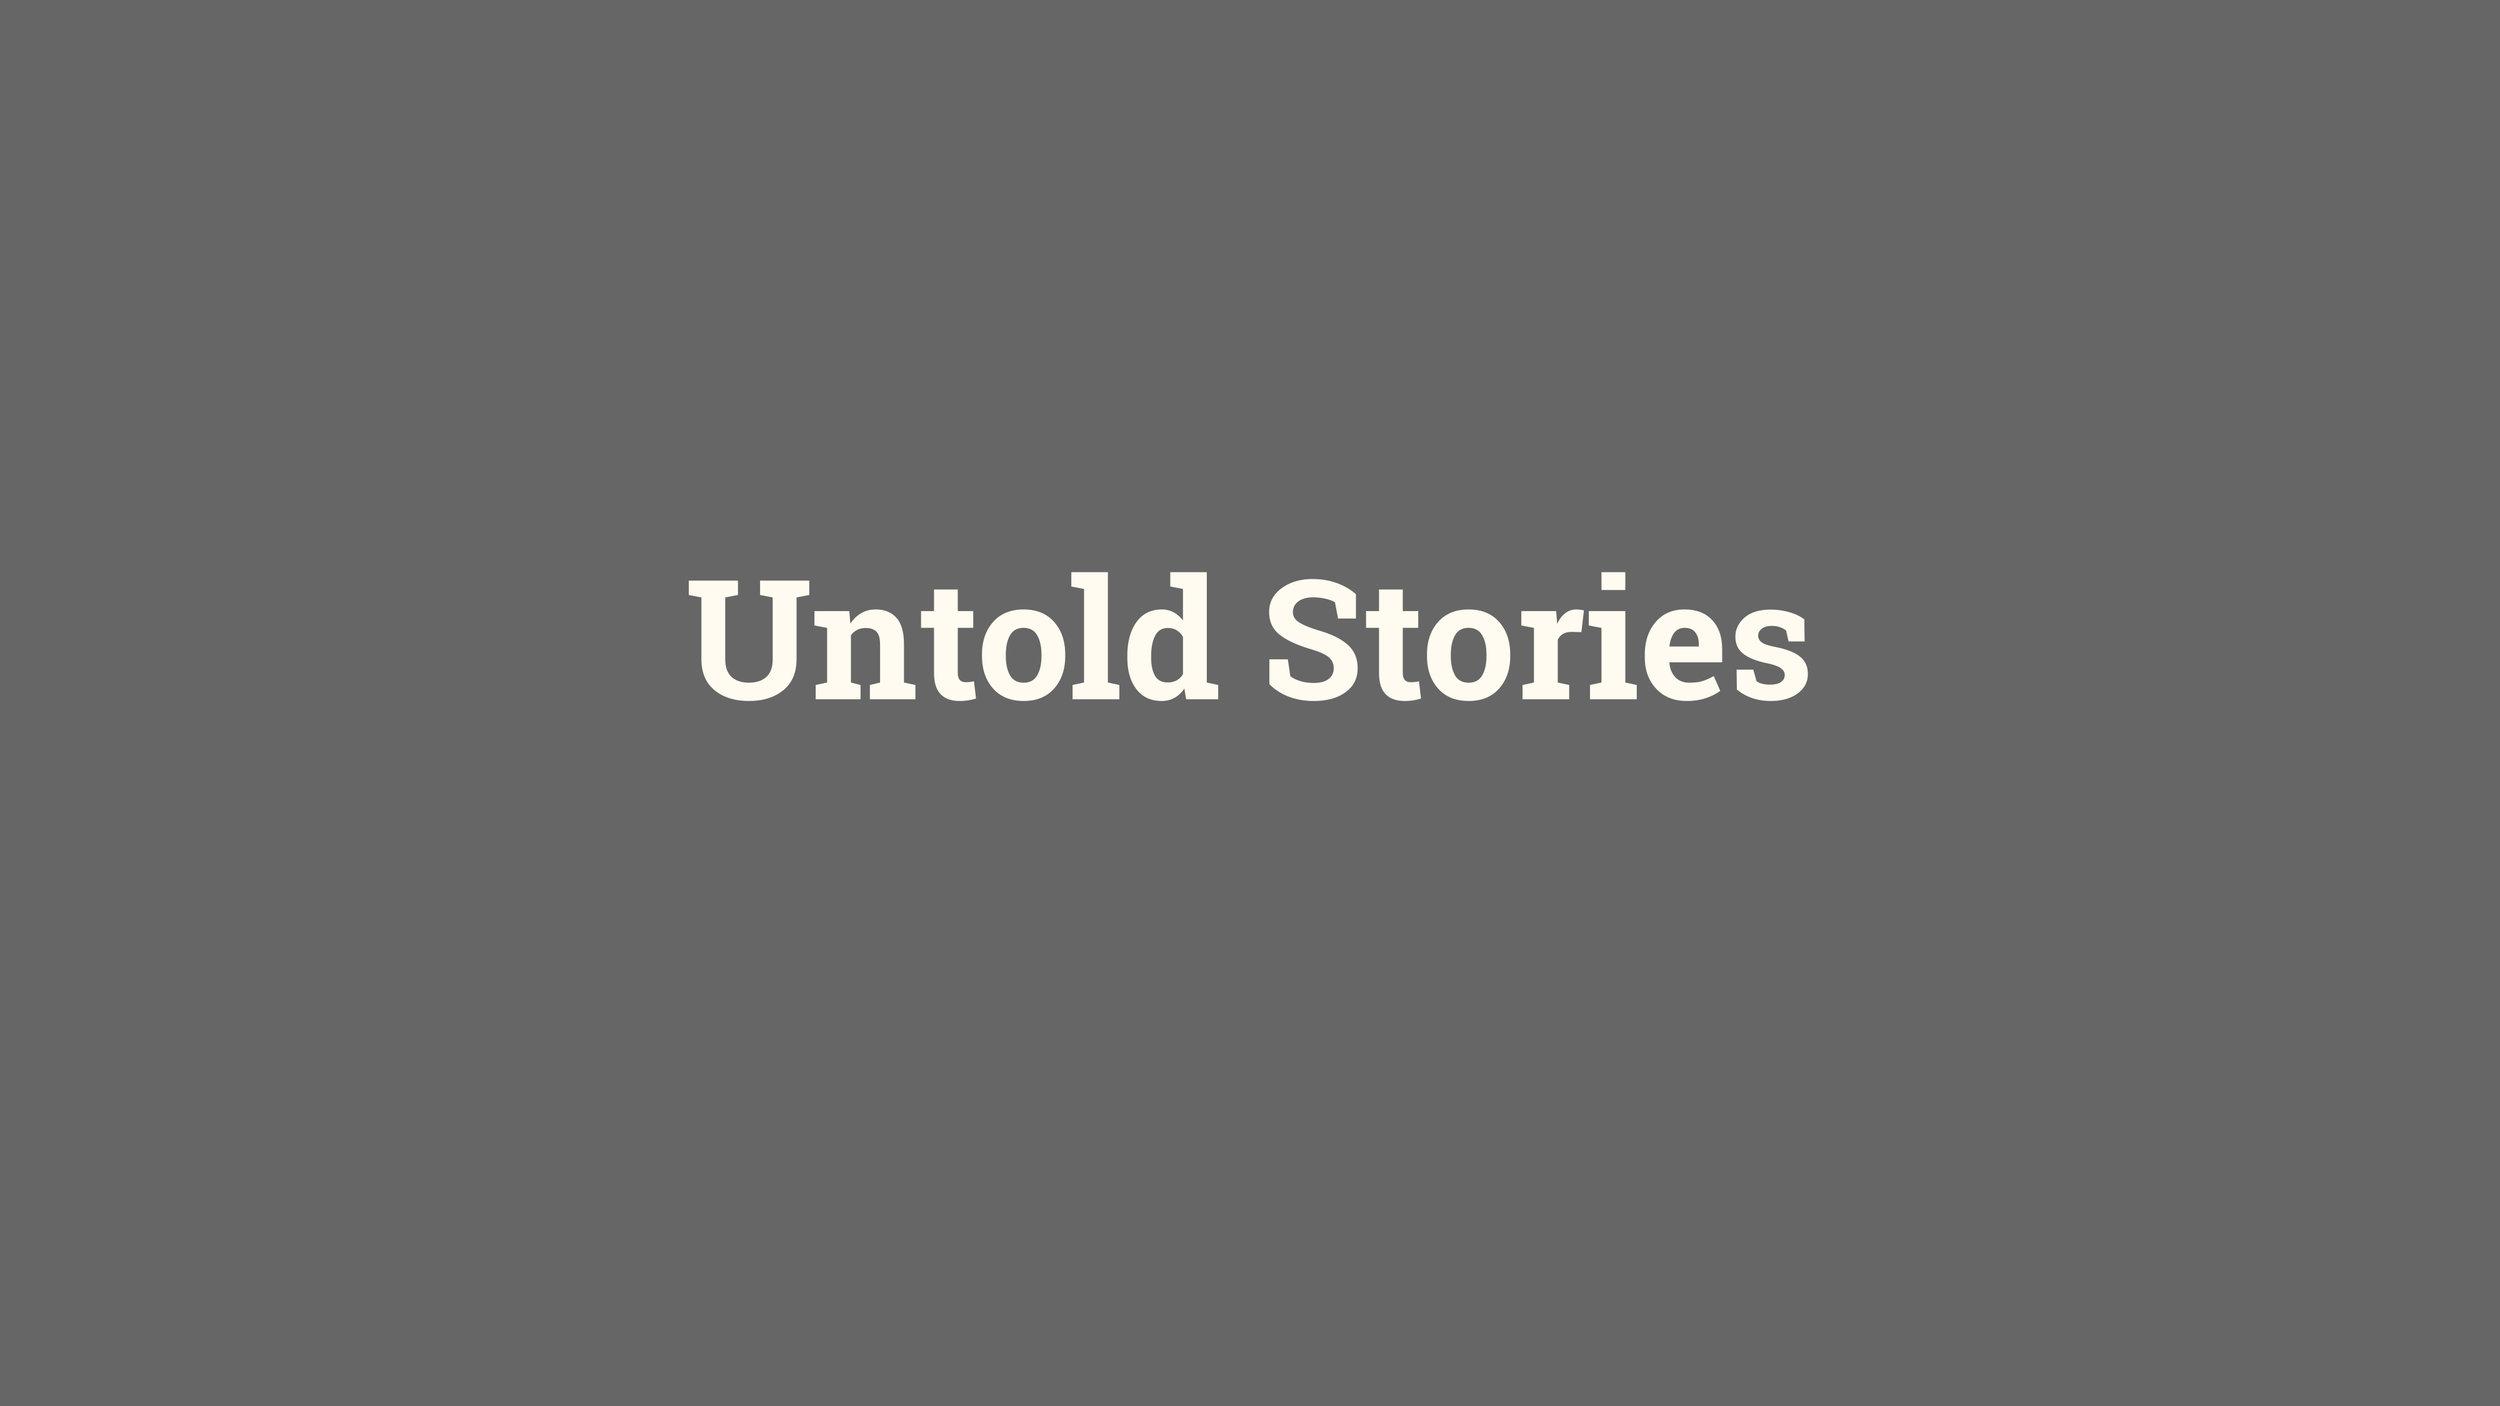 Untold Stories-3.jpg